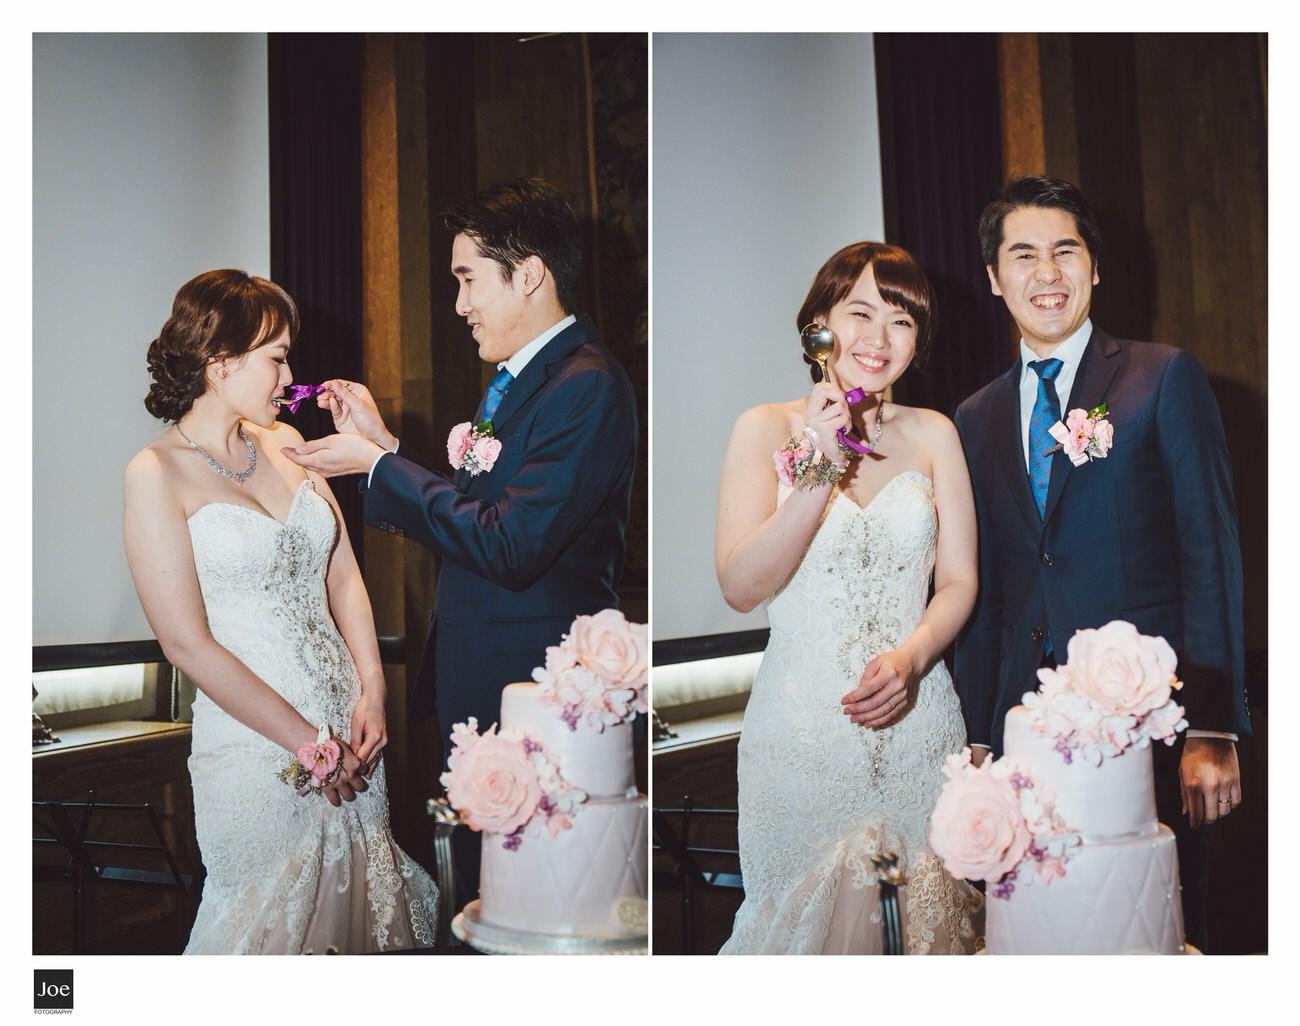 joe-fotography-wedding-photo-palais-de-chine-hotel-023.jpg